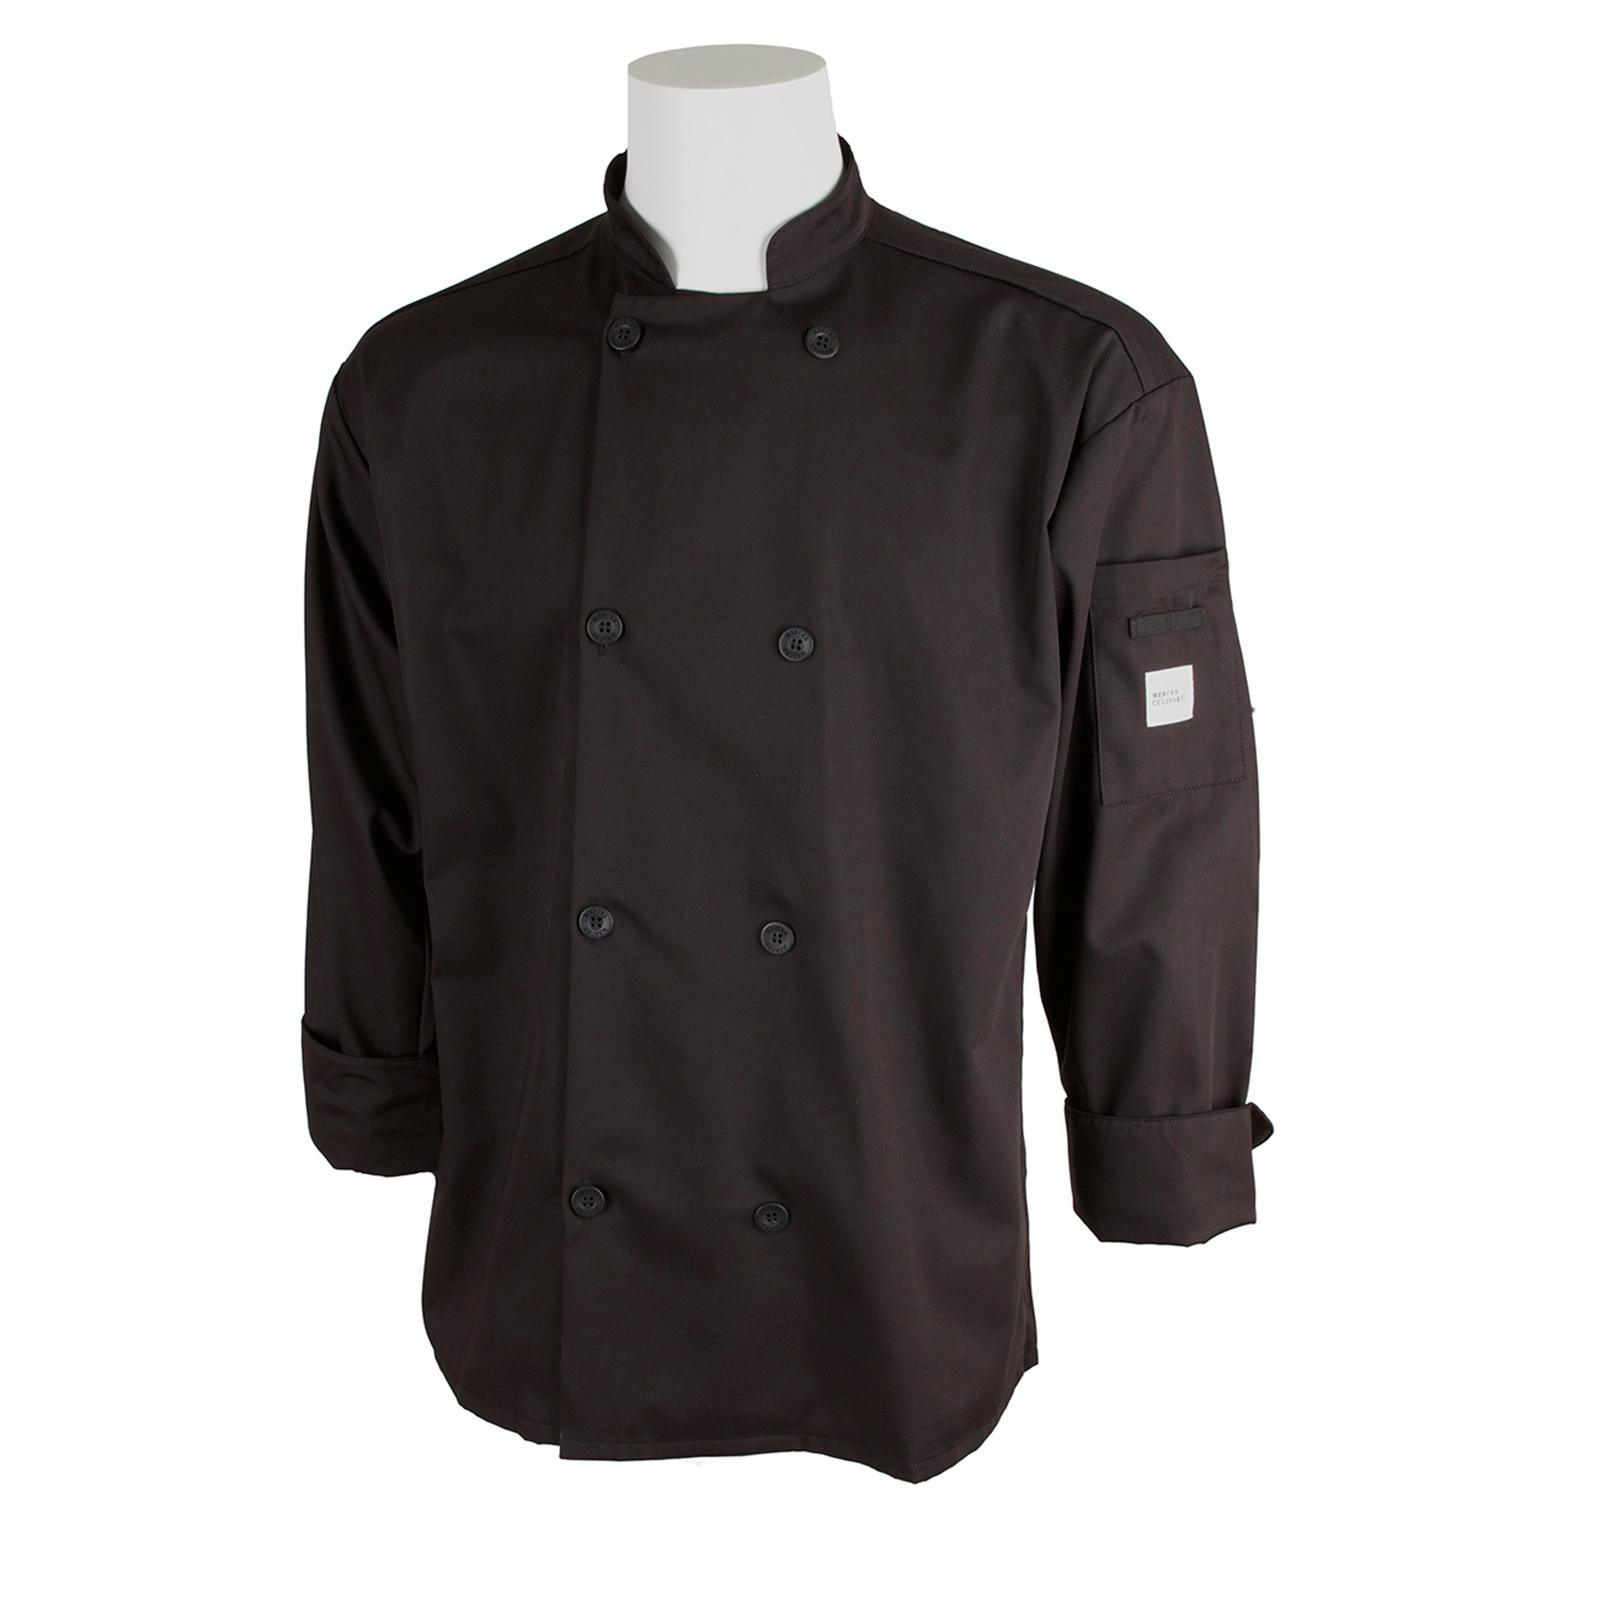 Mercer Culinary M60010BK6X chef's coat